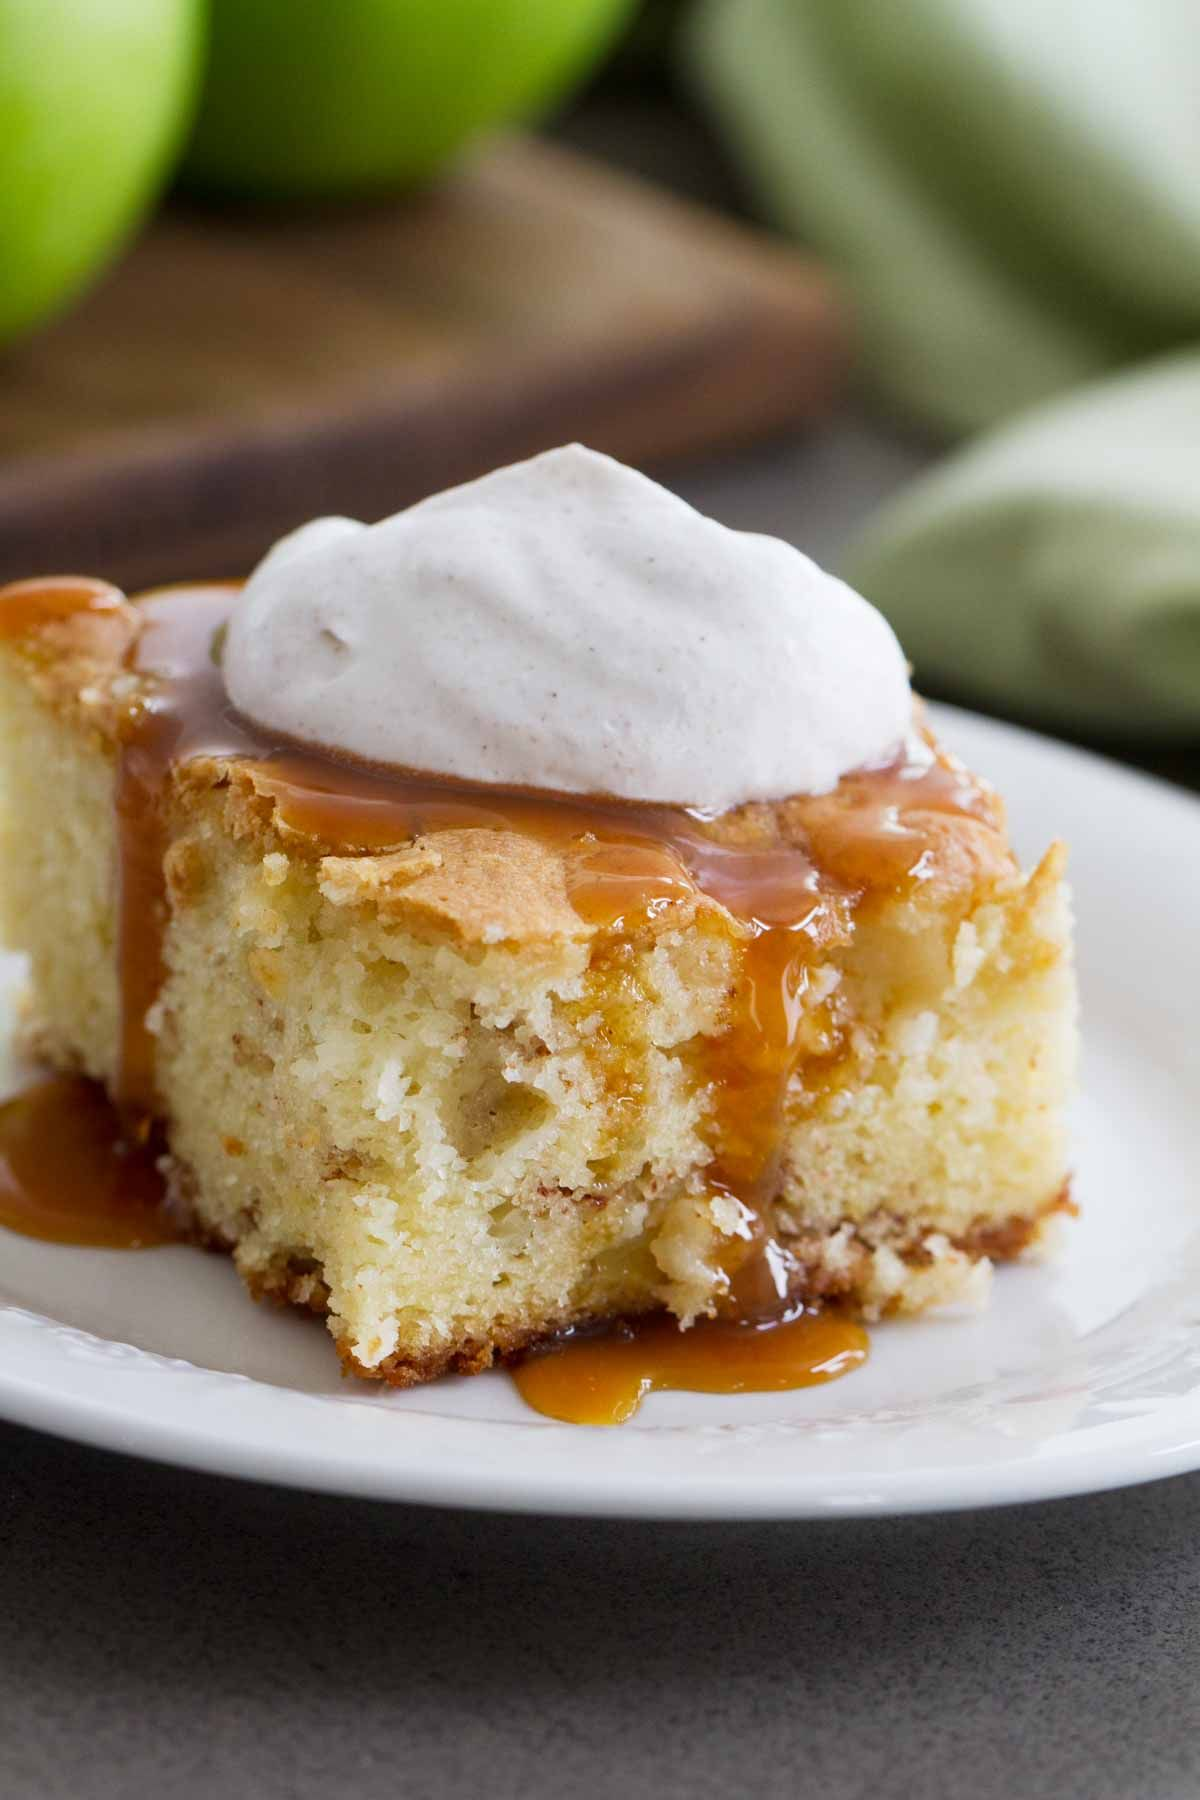 Apple cinnamon cake with cinnamon whipped cream taste